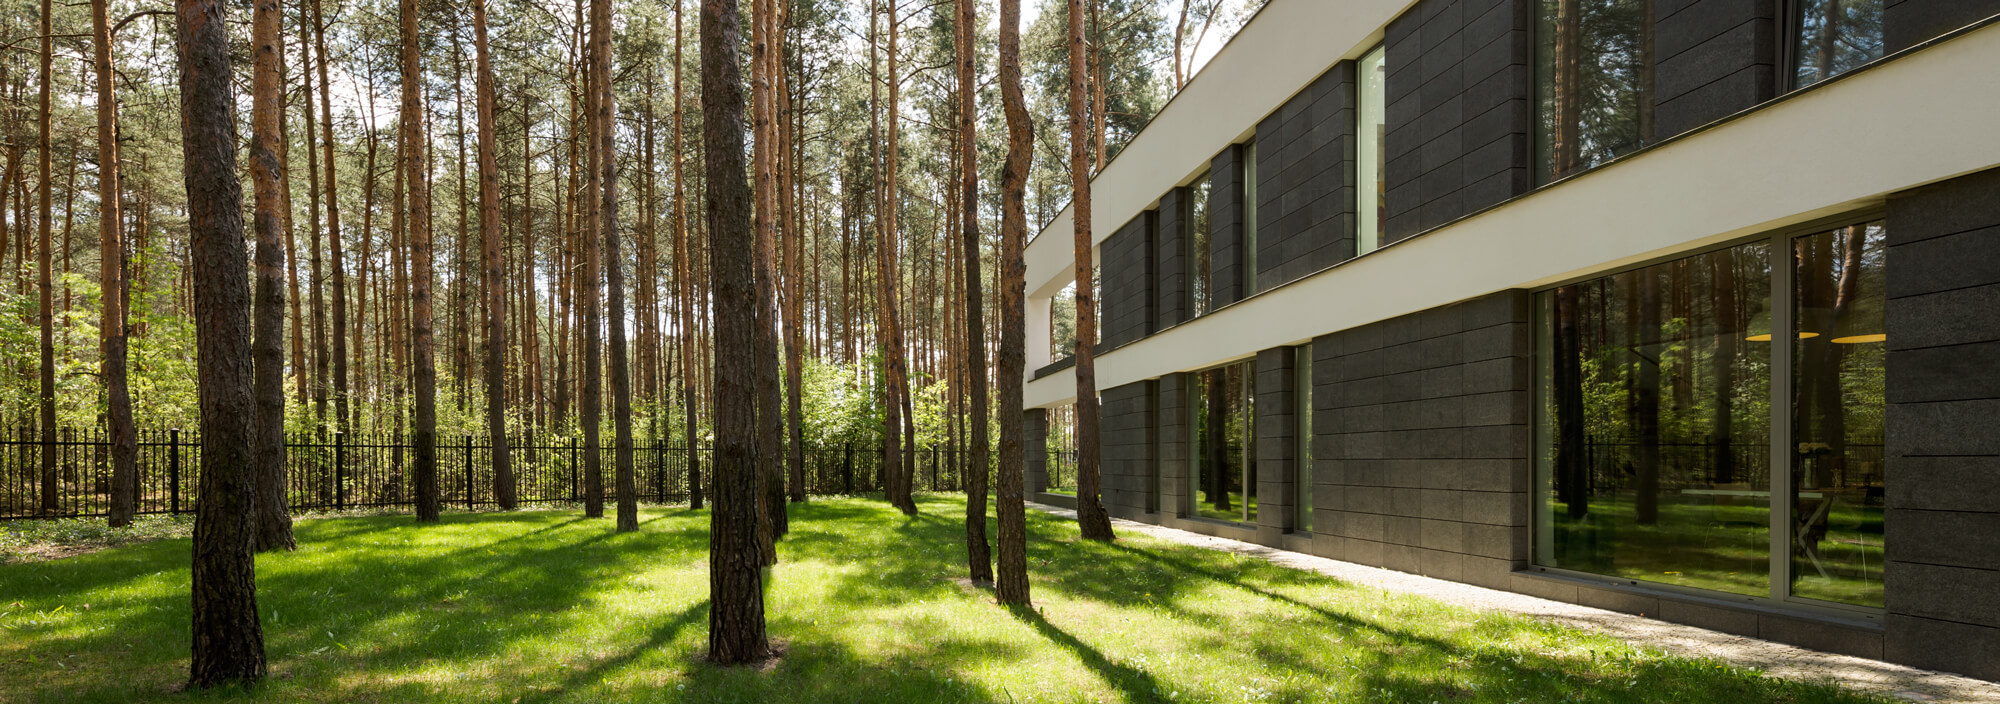 modern rectangular detached house large backyard